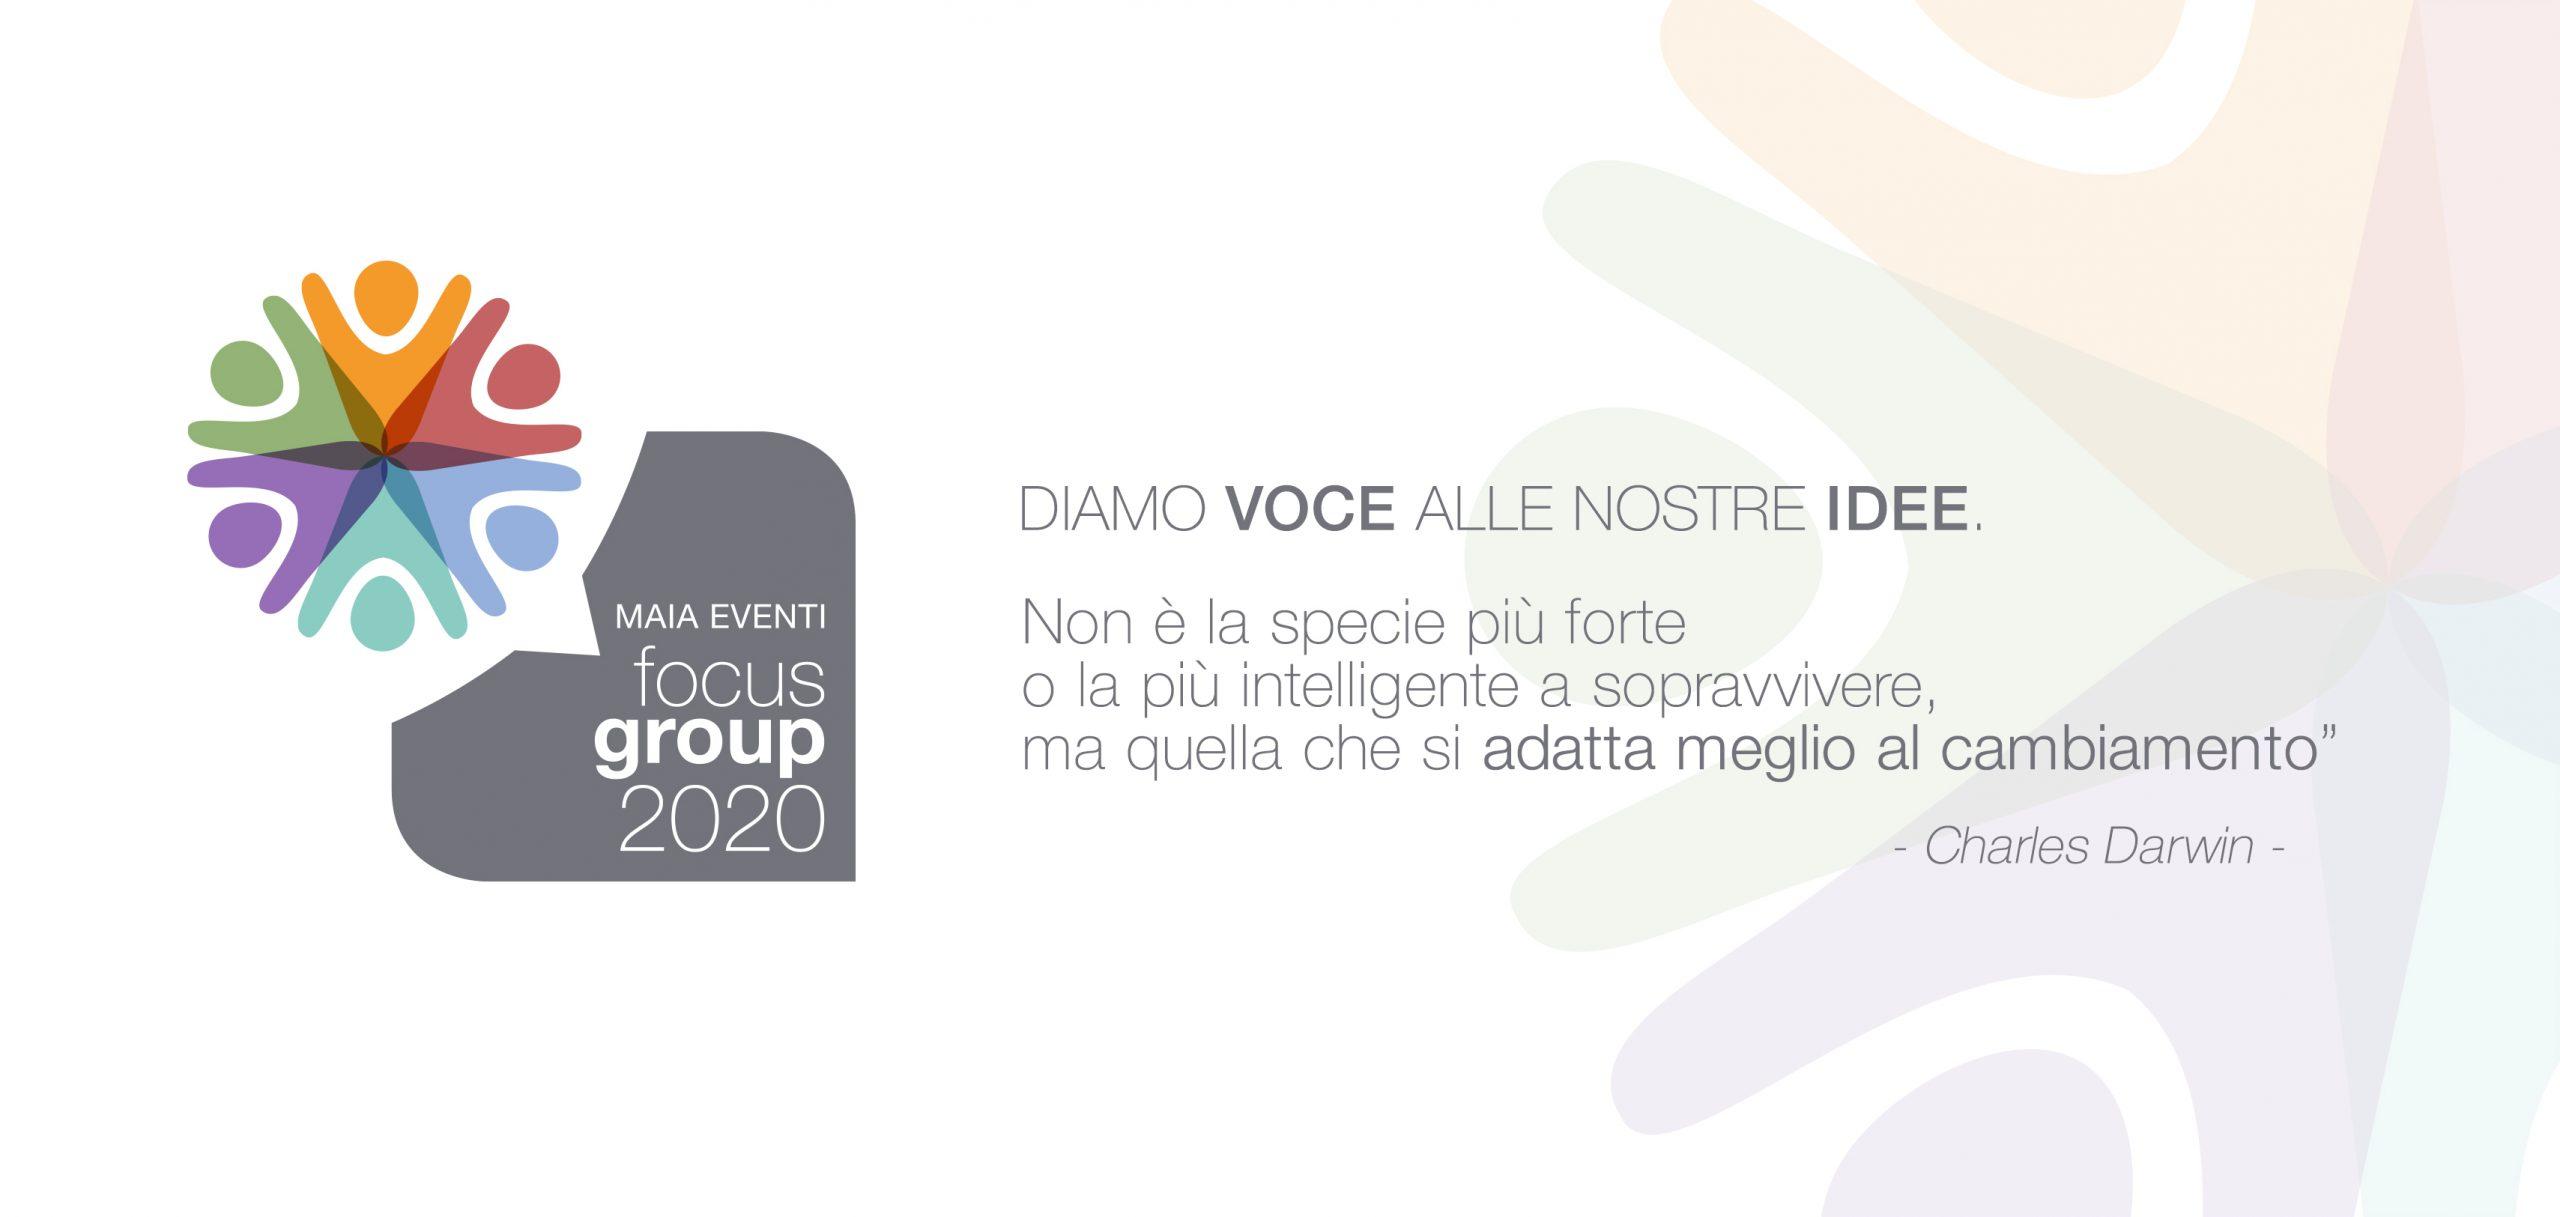 Maia Eventi Focus Group 2020